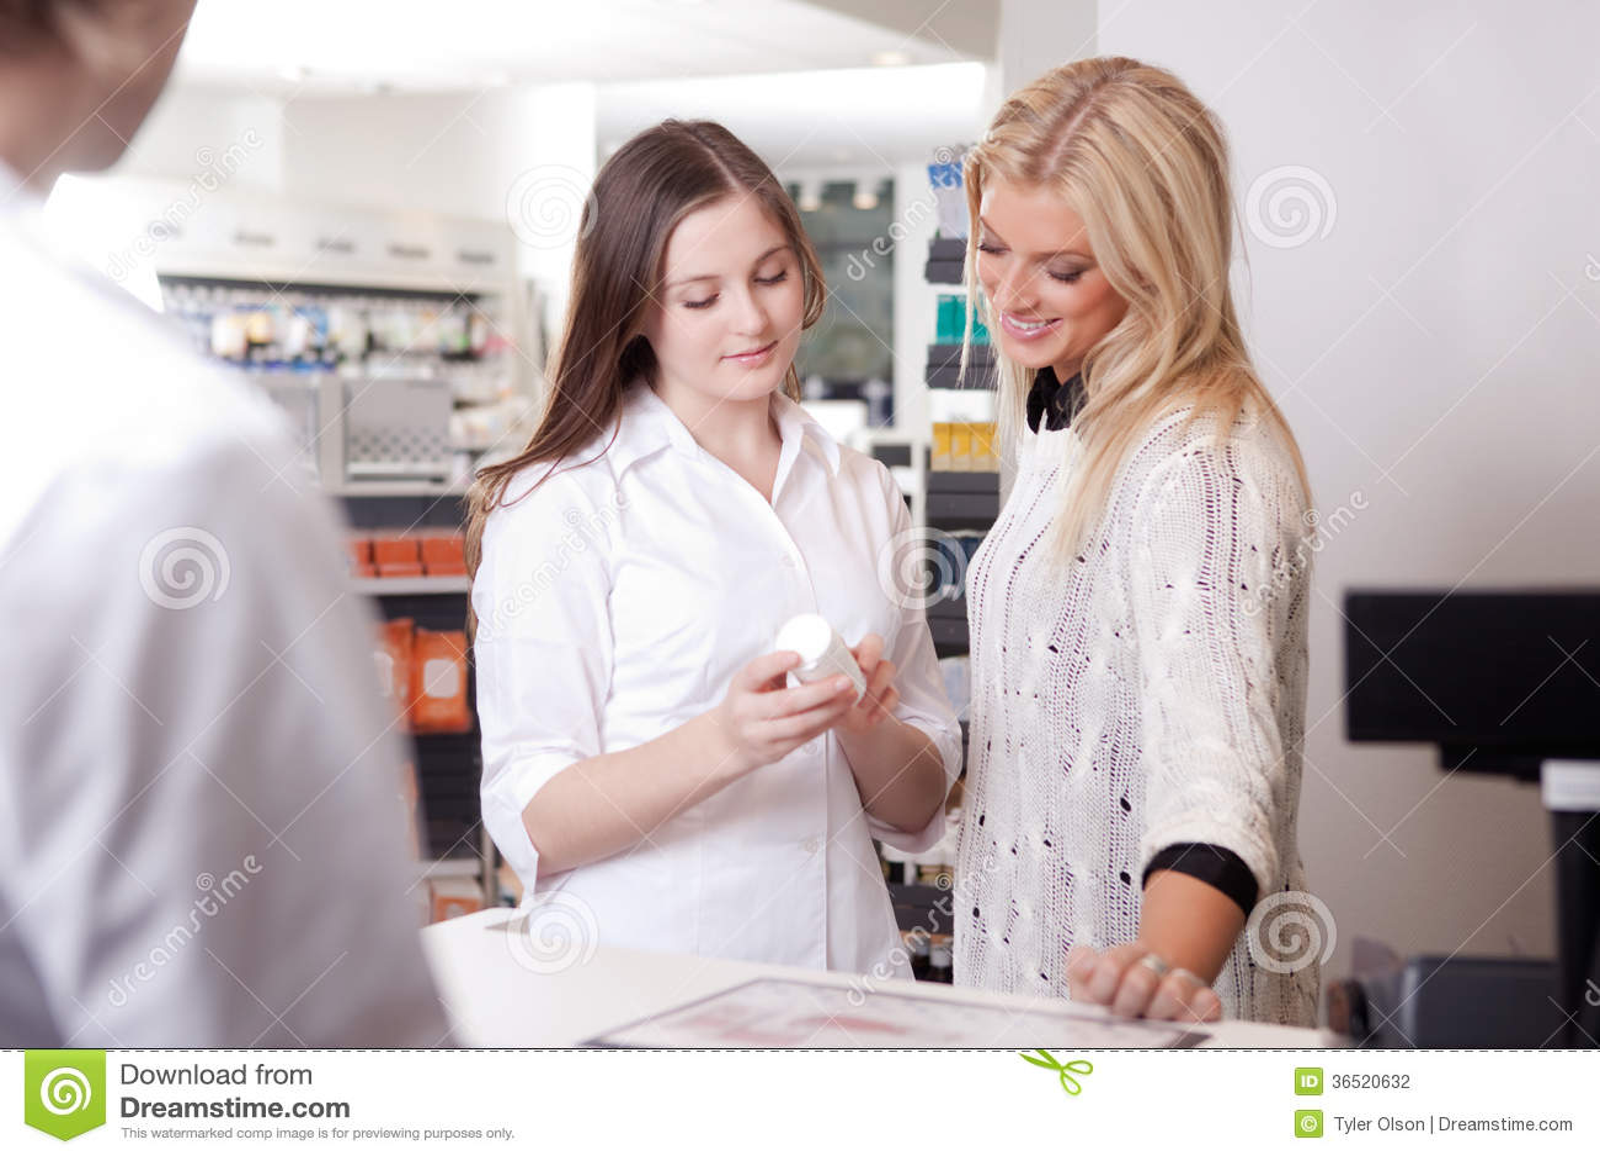 Female Pharmacist Advising Customer At Pharmacy Stock Photo Image